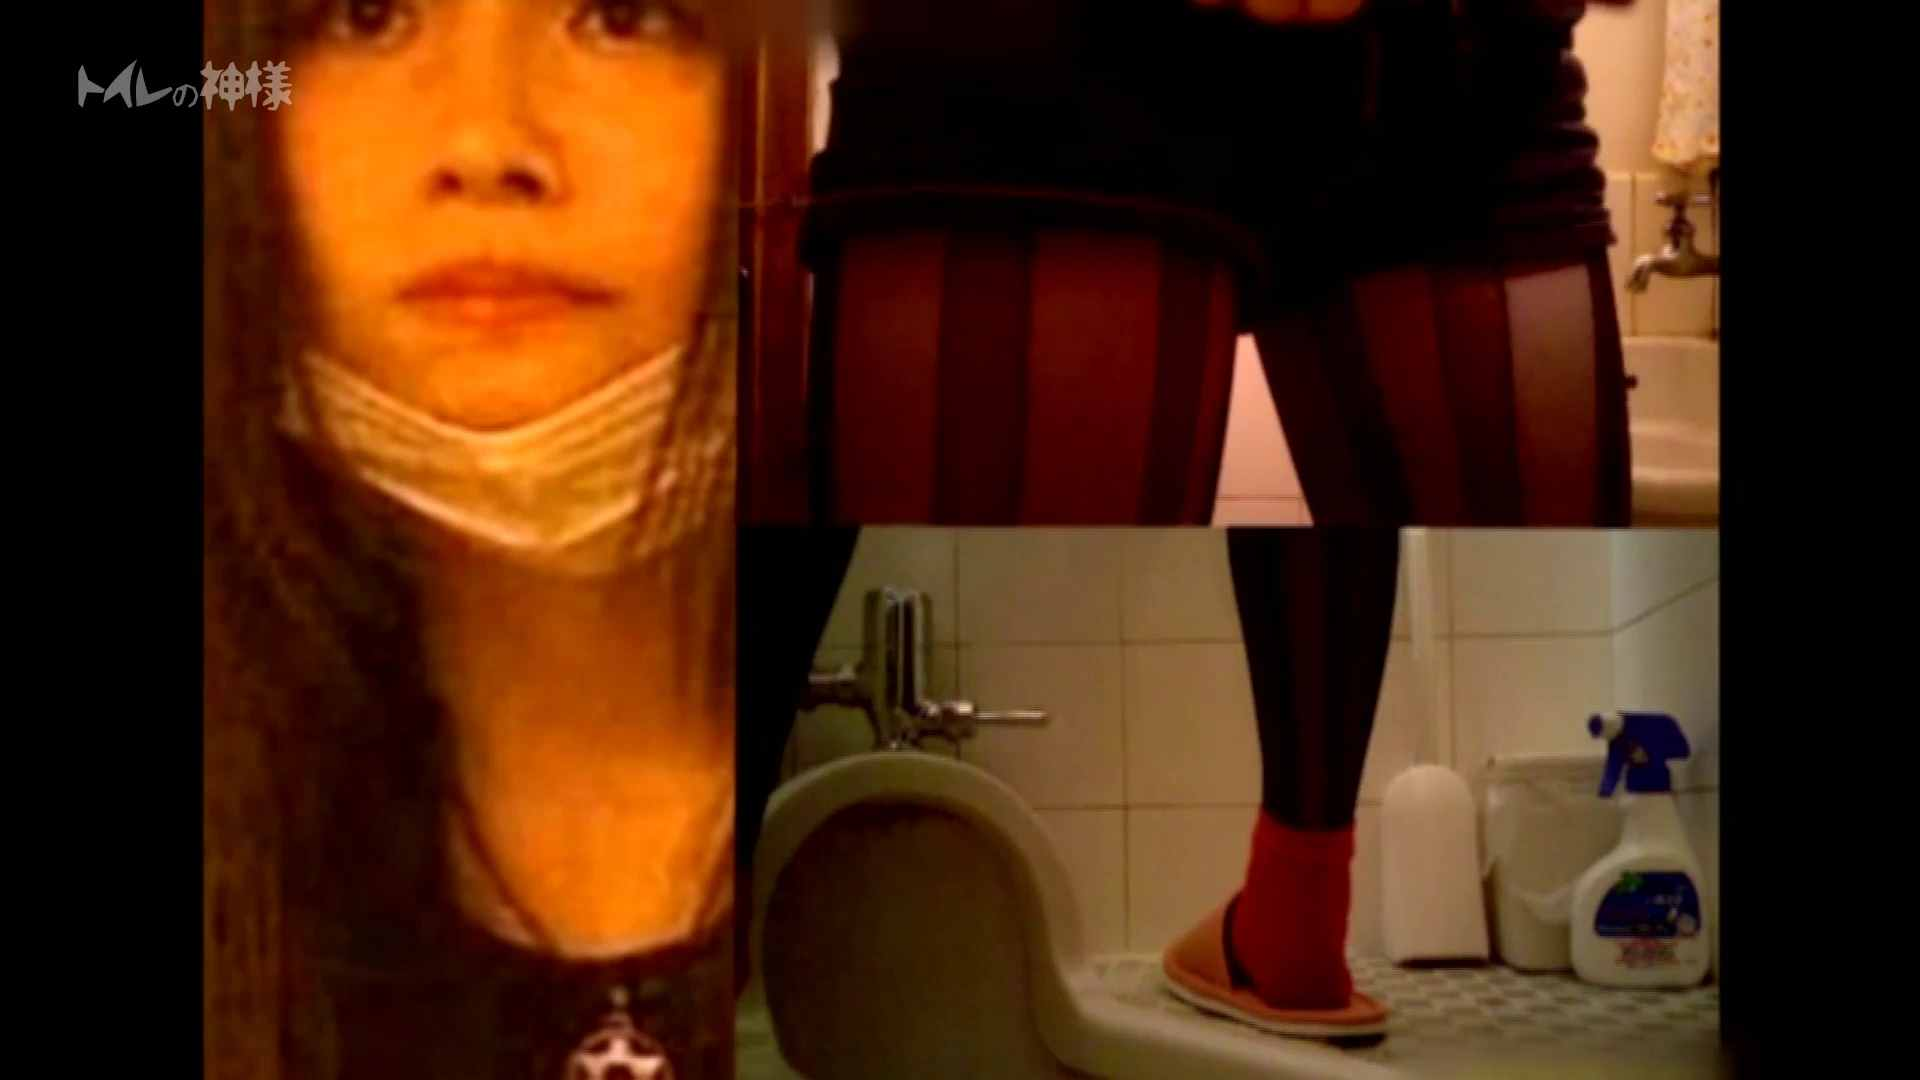 Vol.02 花の女子大生うんこ盗撮2 トイレ中 | 盗撮エロすぎ  34連発 4